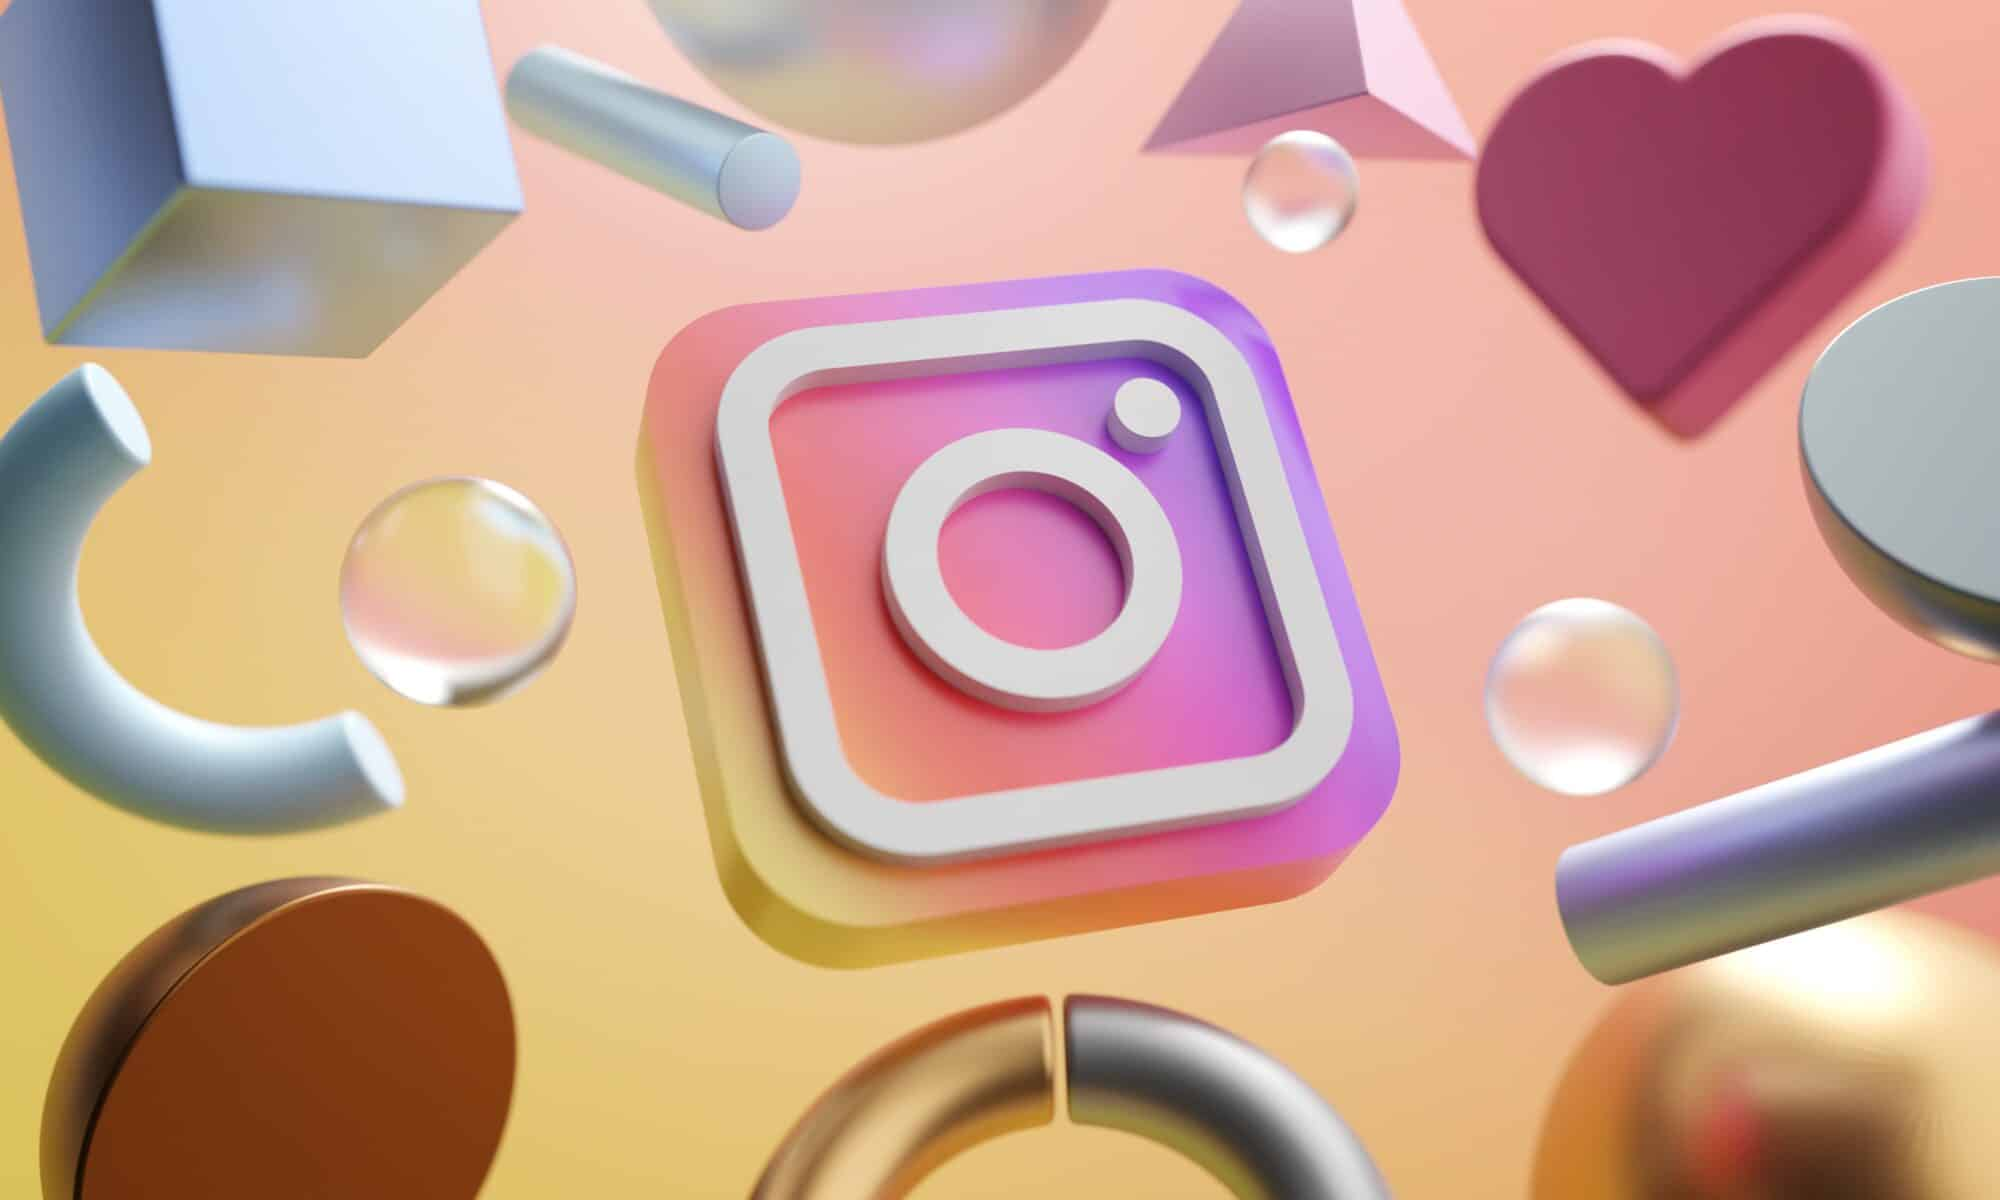 logo instagram smartphone android